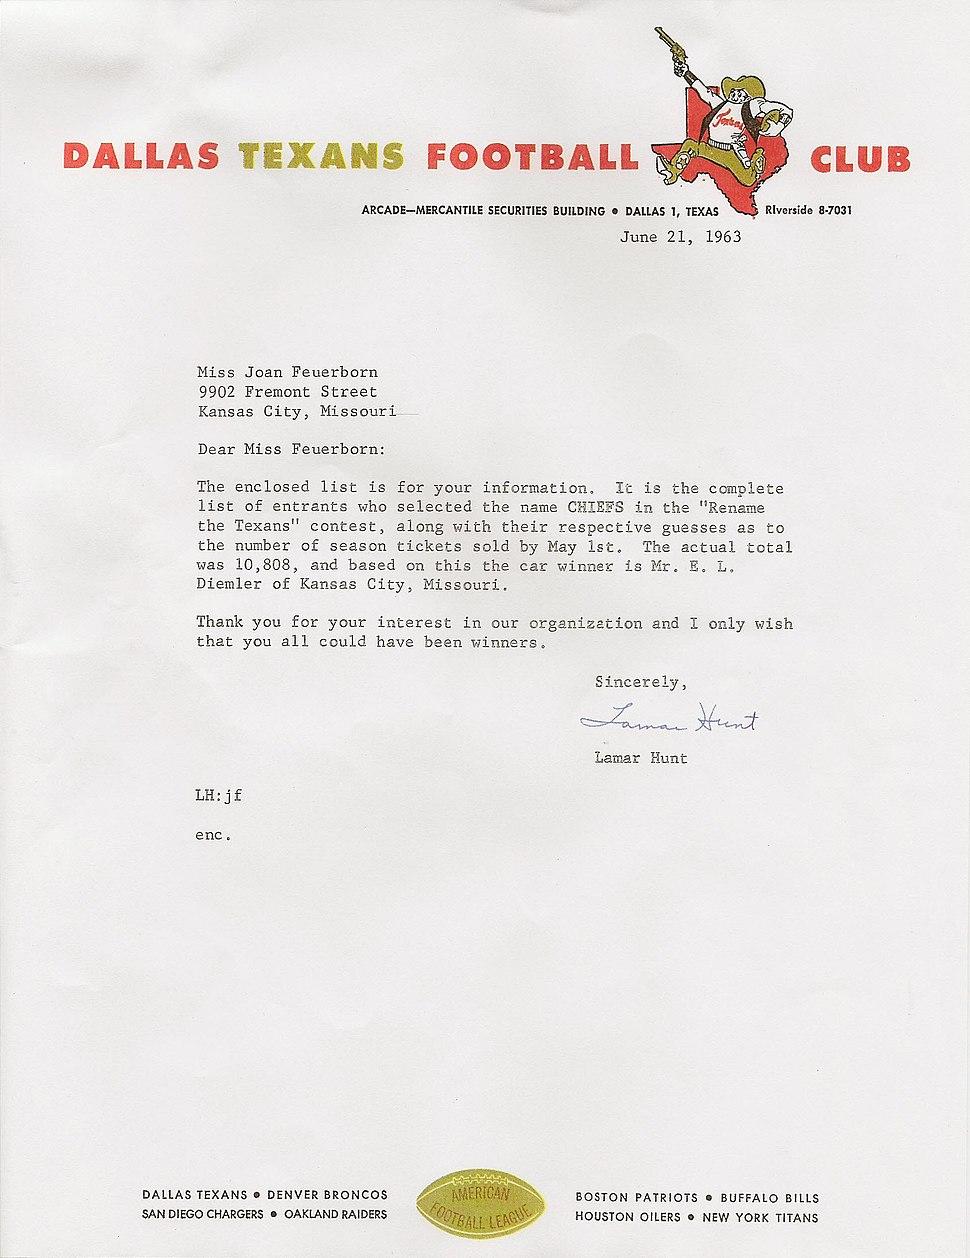 DallasTexansFootballClubNamingContestChiefs